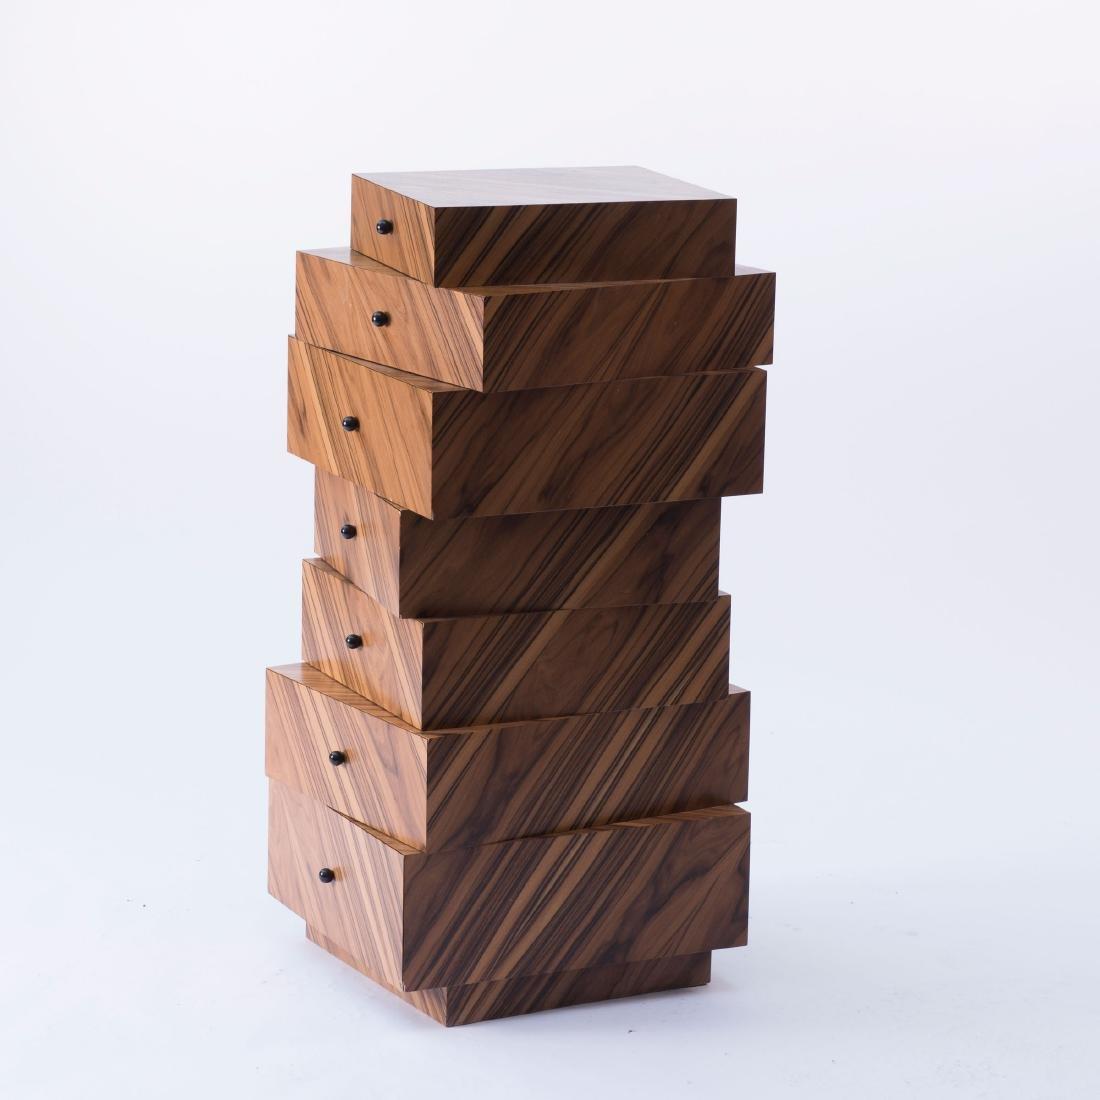 'Schubladenstapel' dresser, 1982 - 5